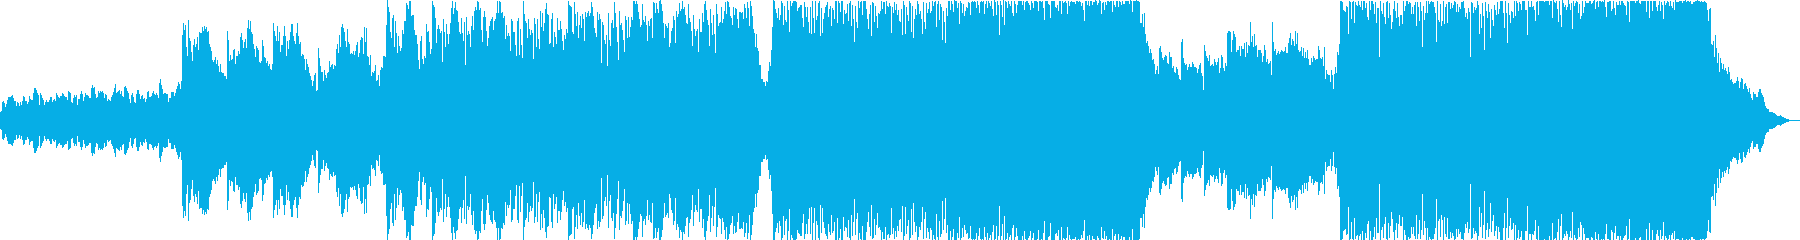 Inspiring Piano Epicの再生済みの波形